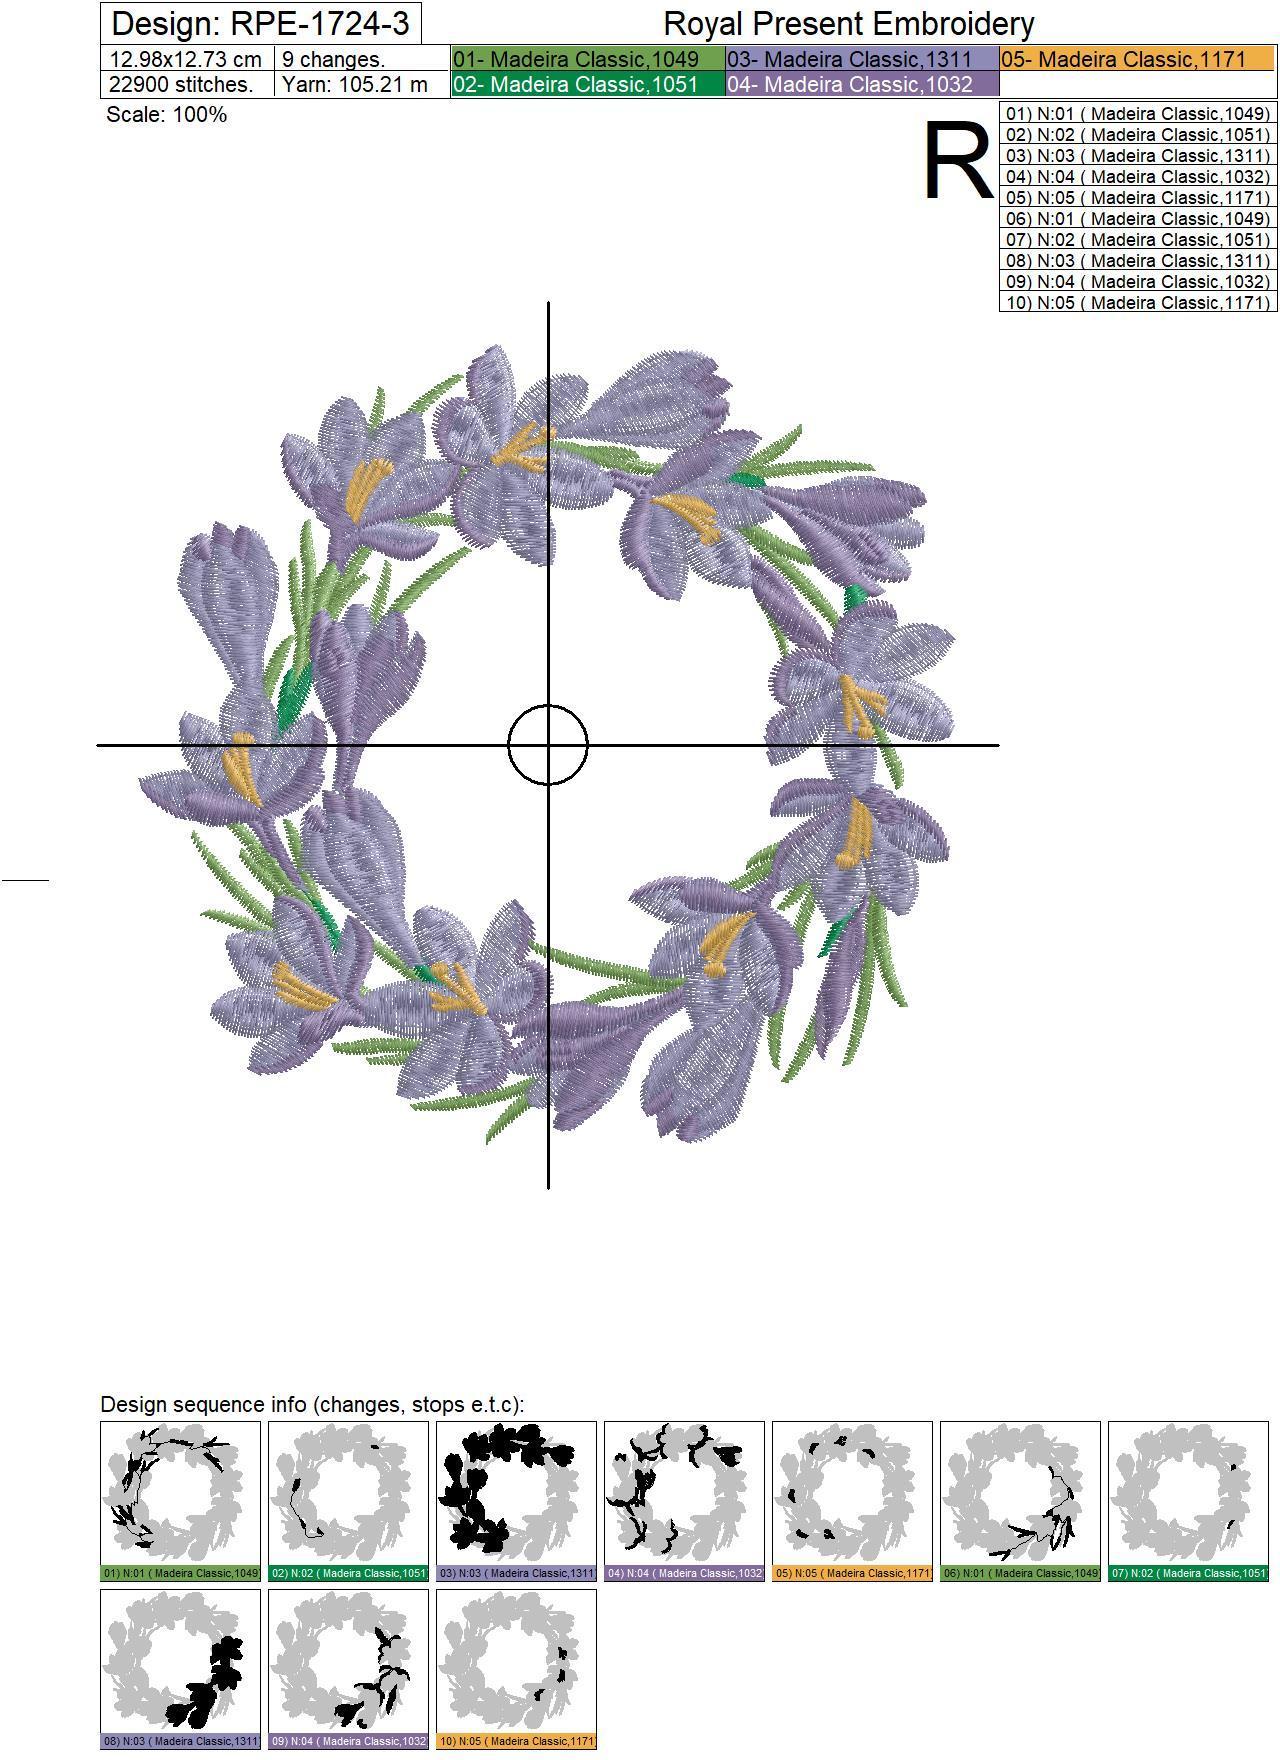 Crocus Wreath Machine Embroidery Design - 3 sizes